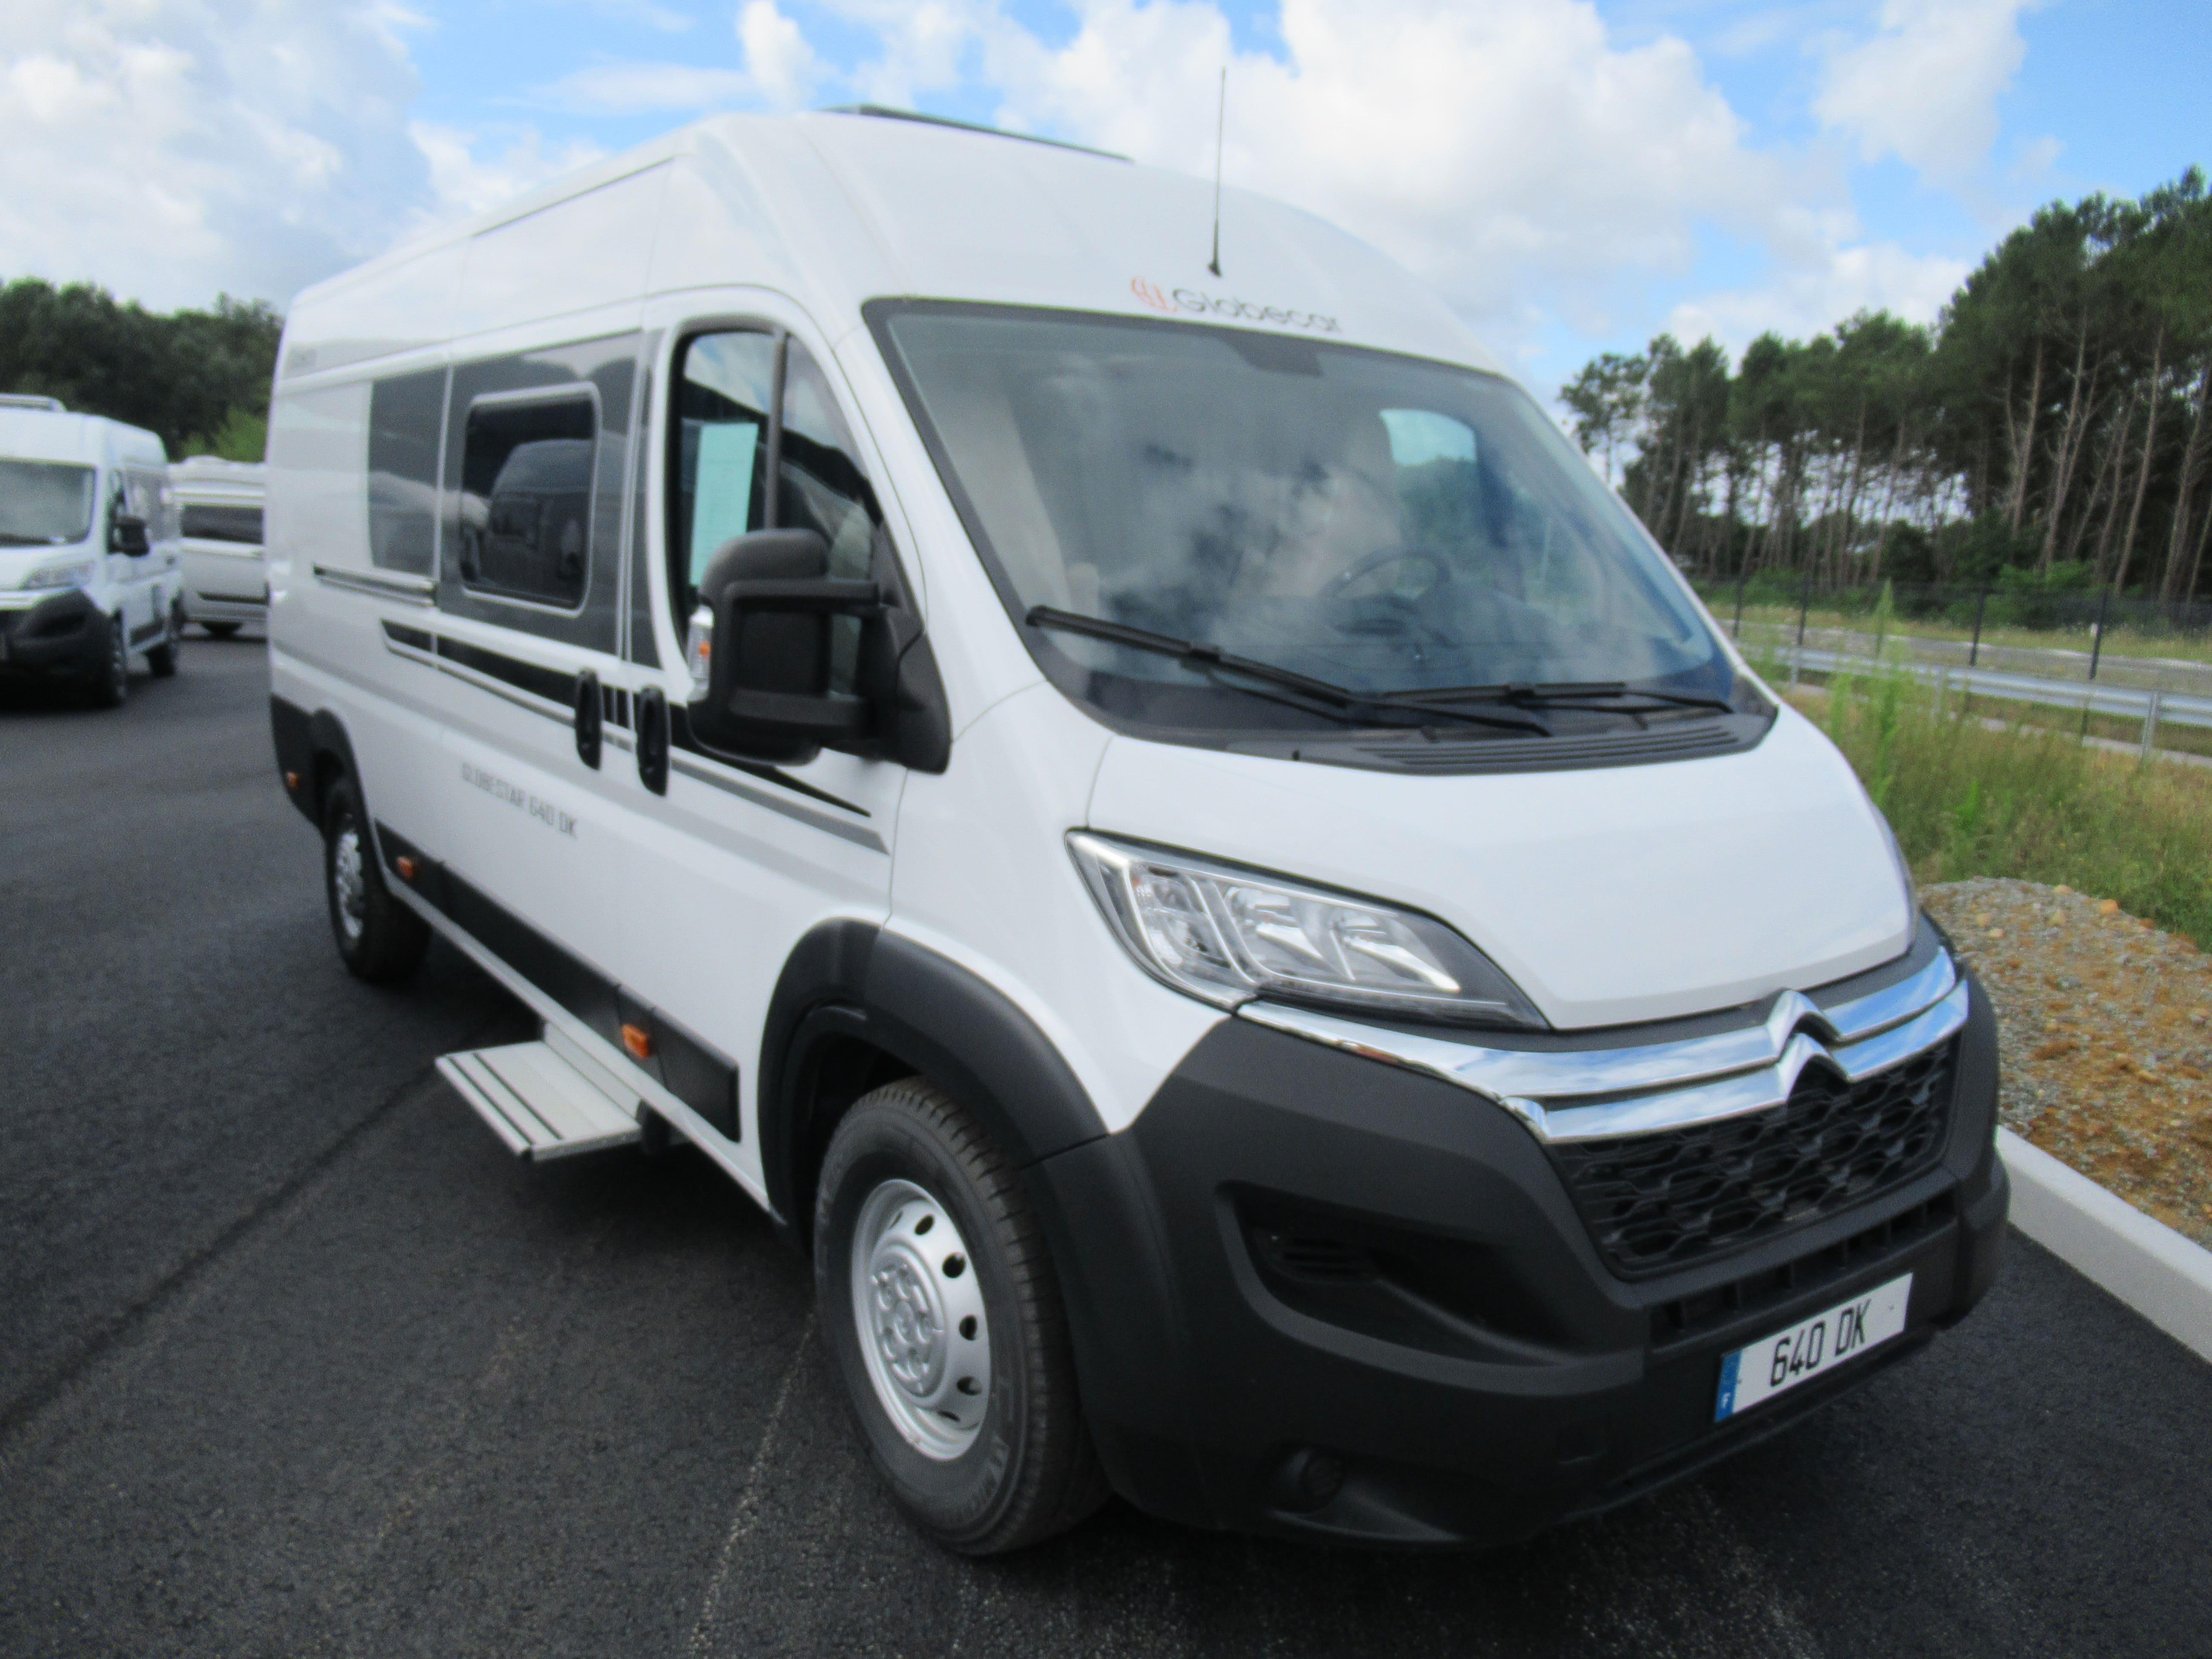 Camping-car GLOBECAR GLOBESTAR 640 DK